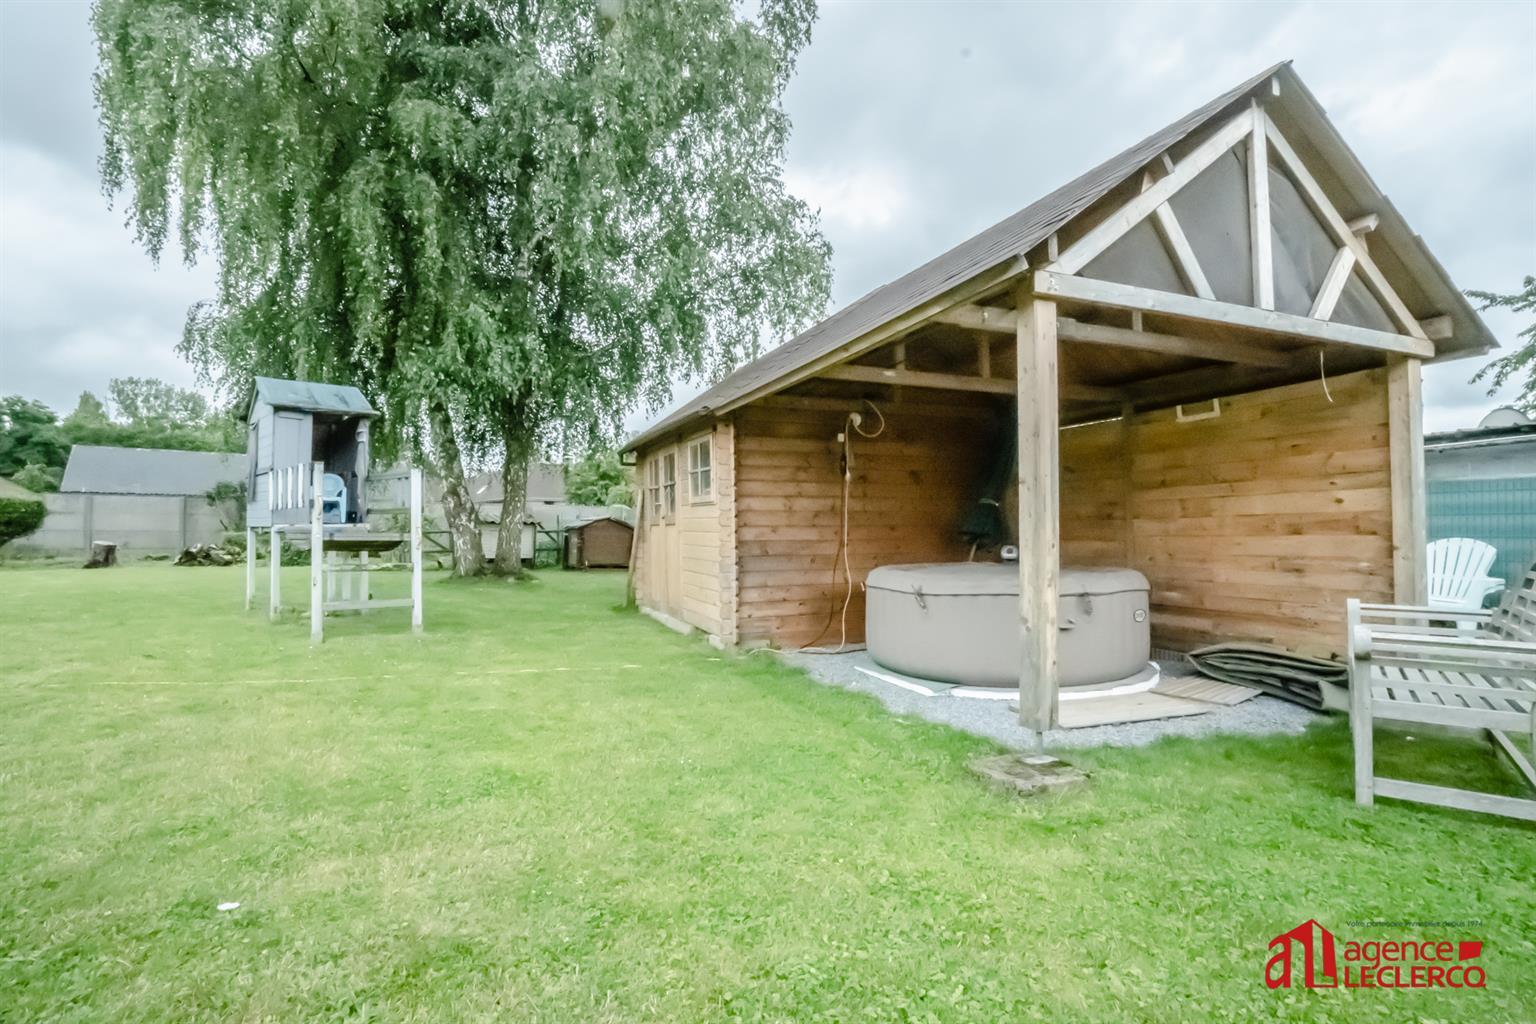 Maison - Gaurain-Ramecroix - #4408184-24